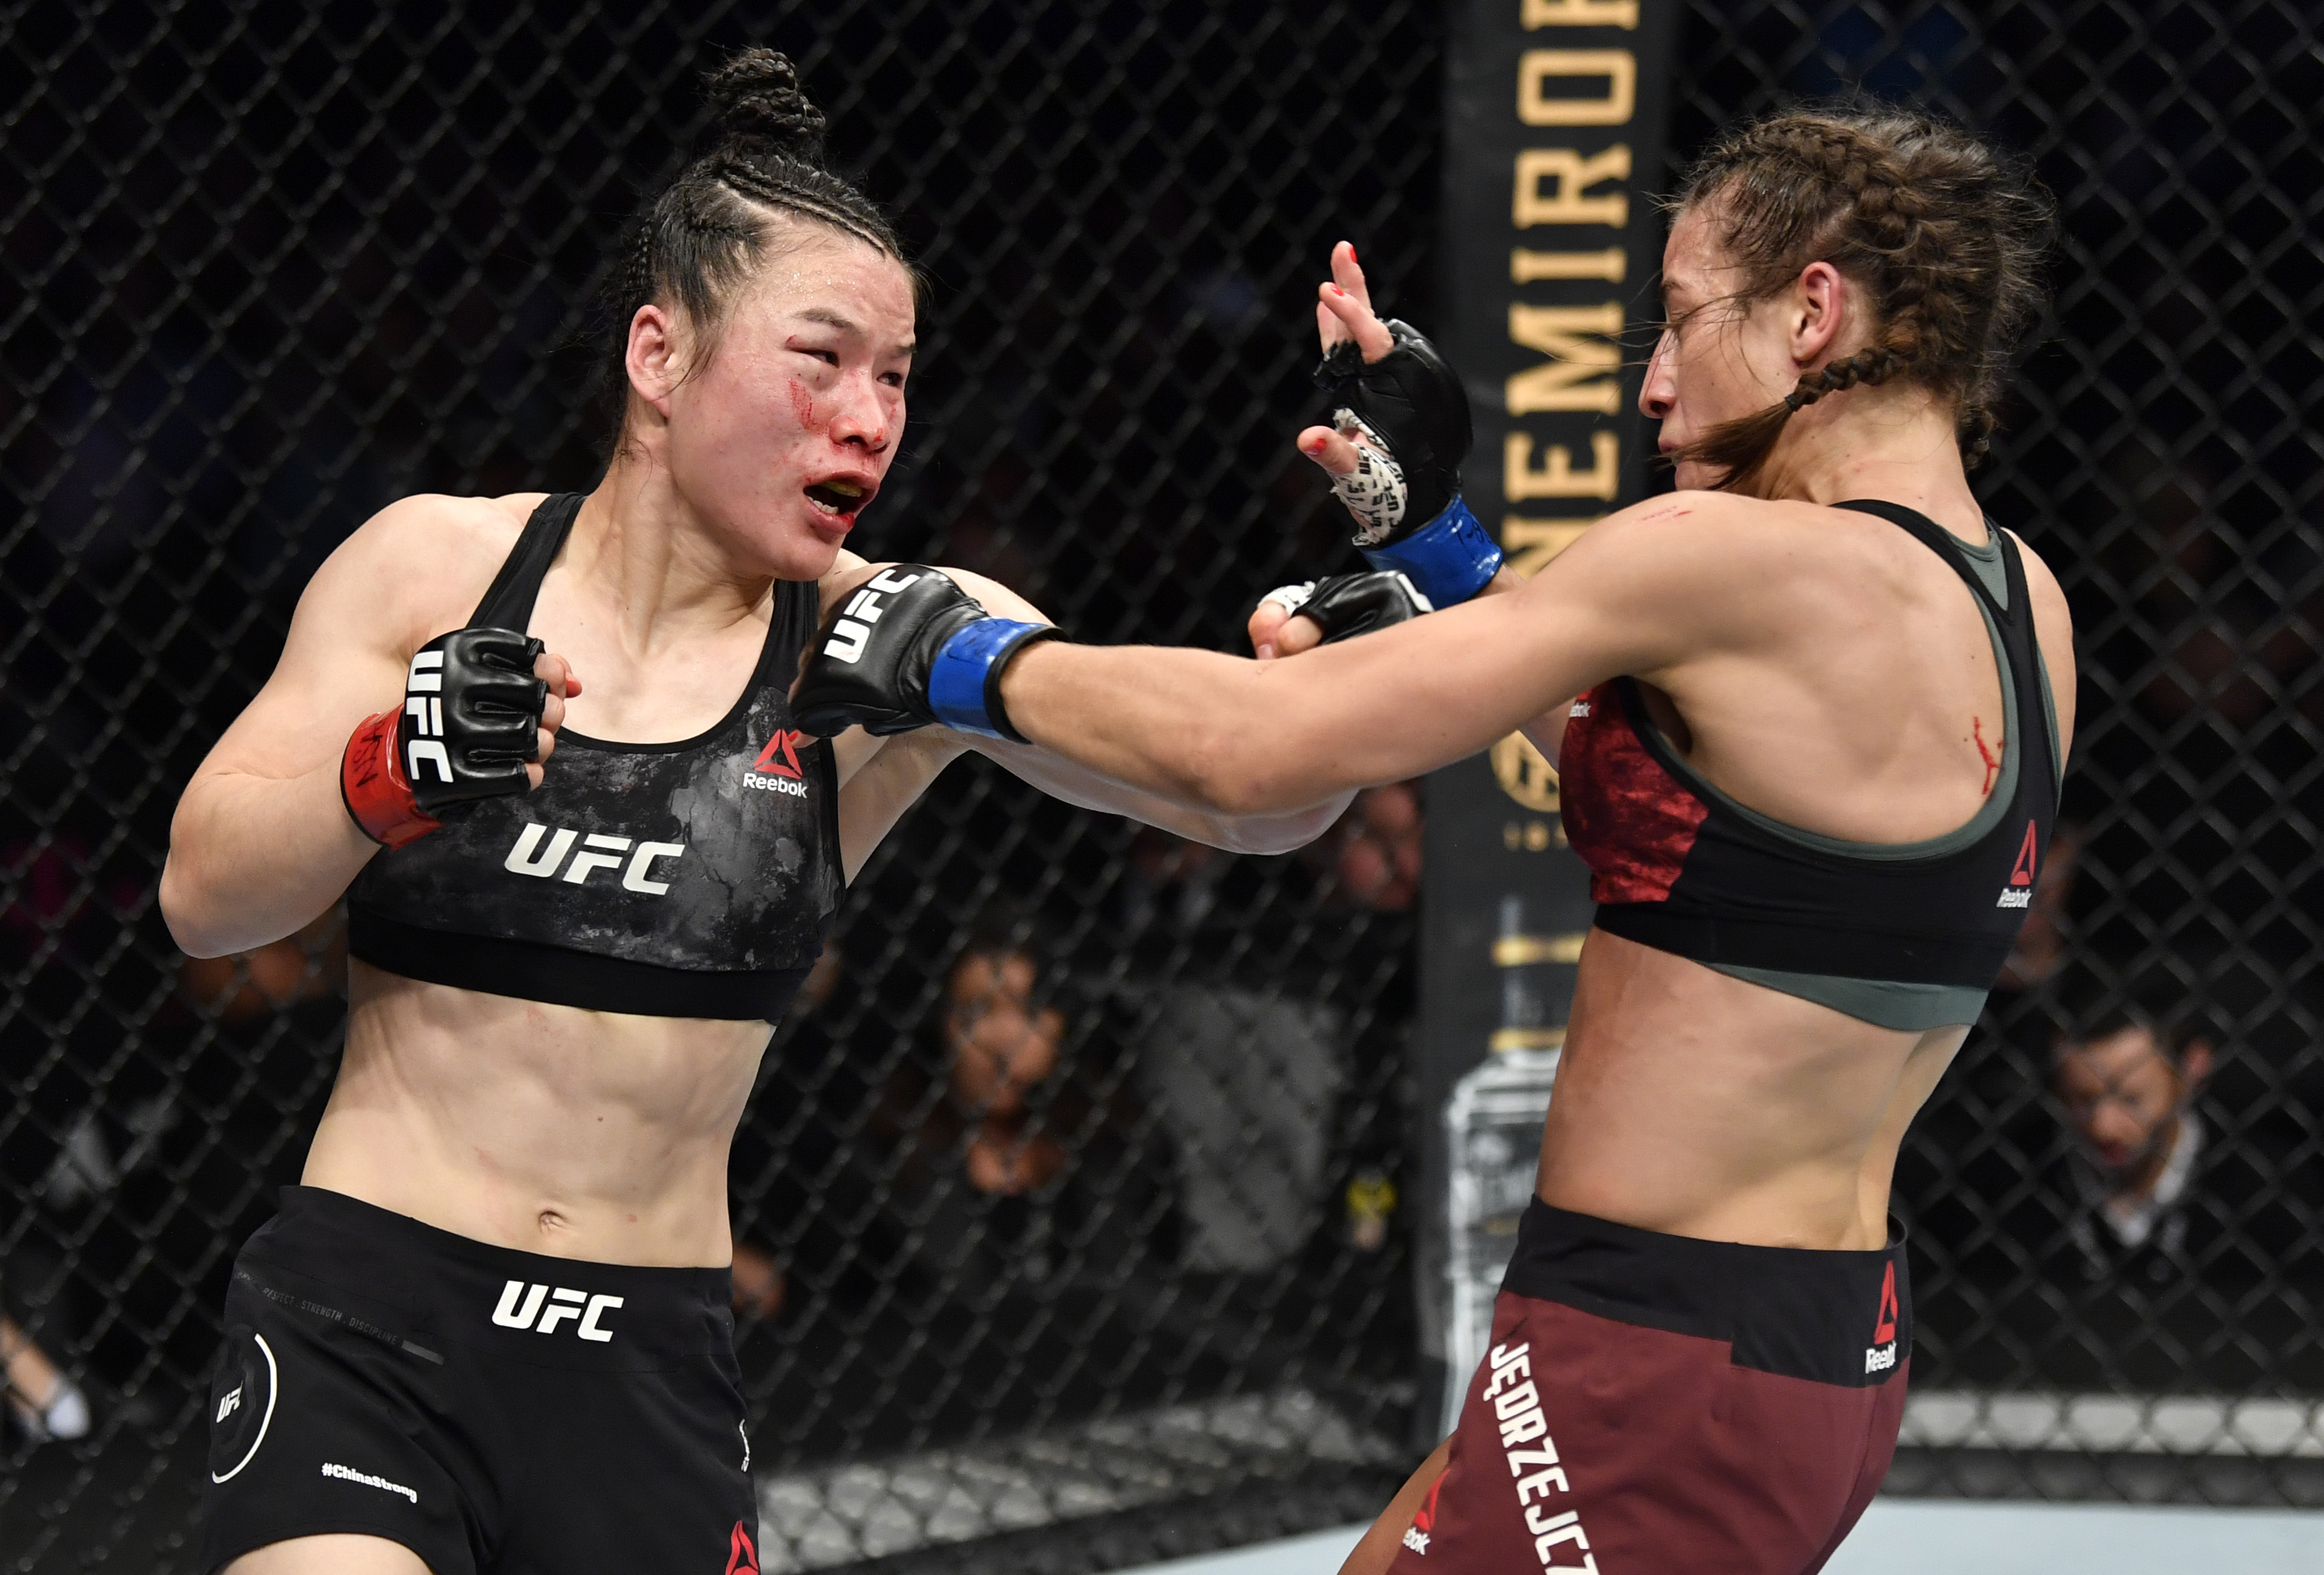 How to watch UFC 248: Adesanya vs Romero TONIGHT on ESPN+ PPV